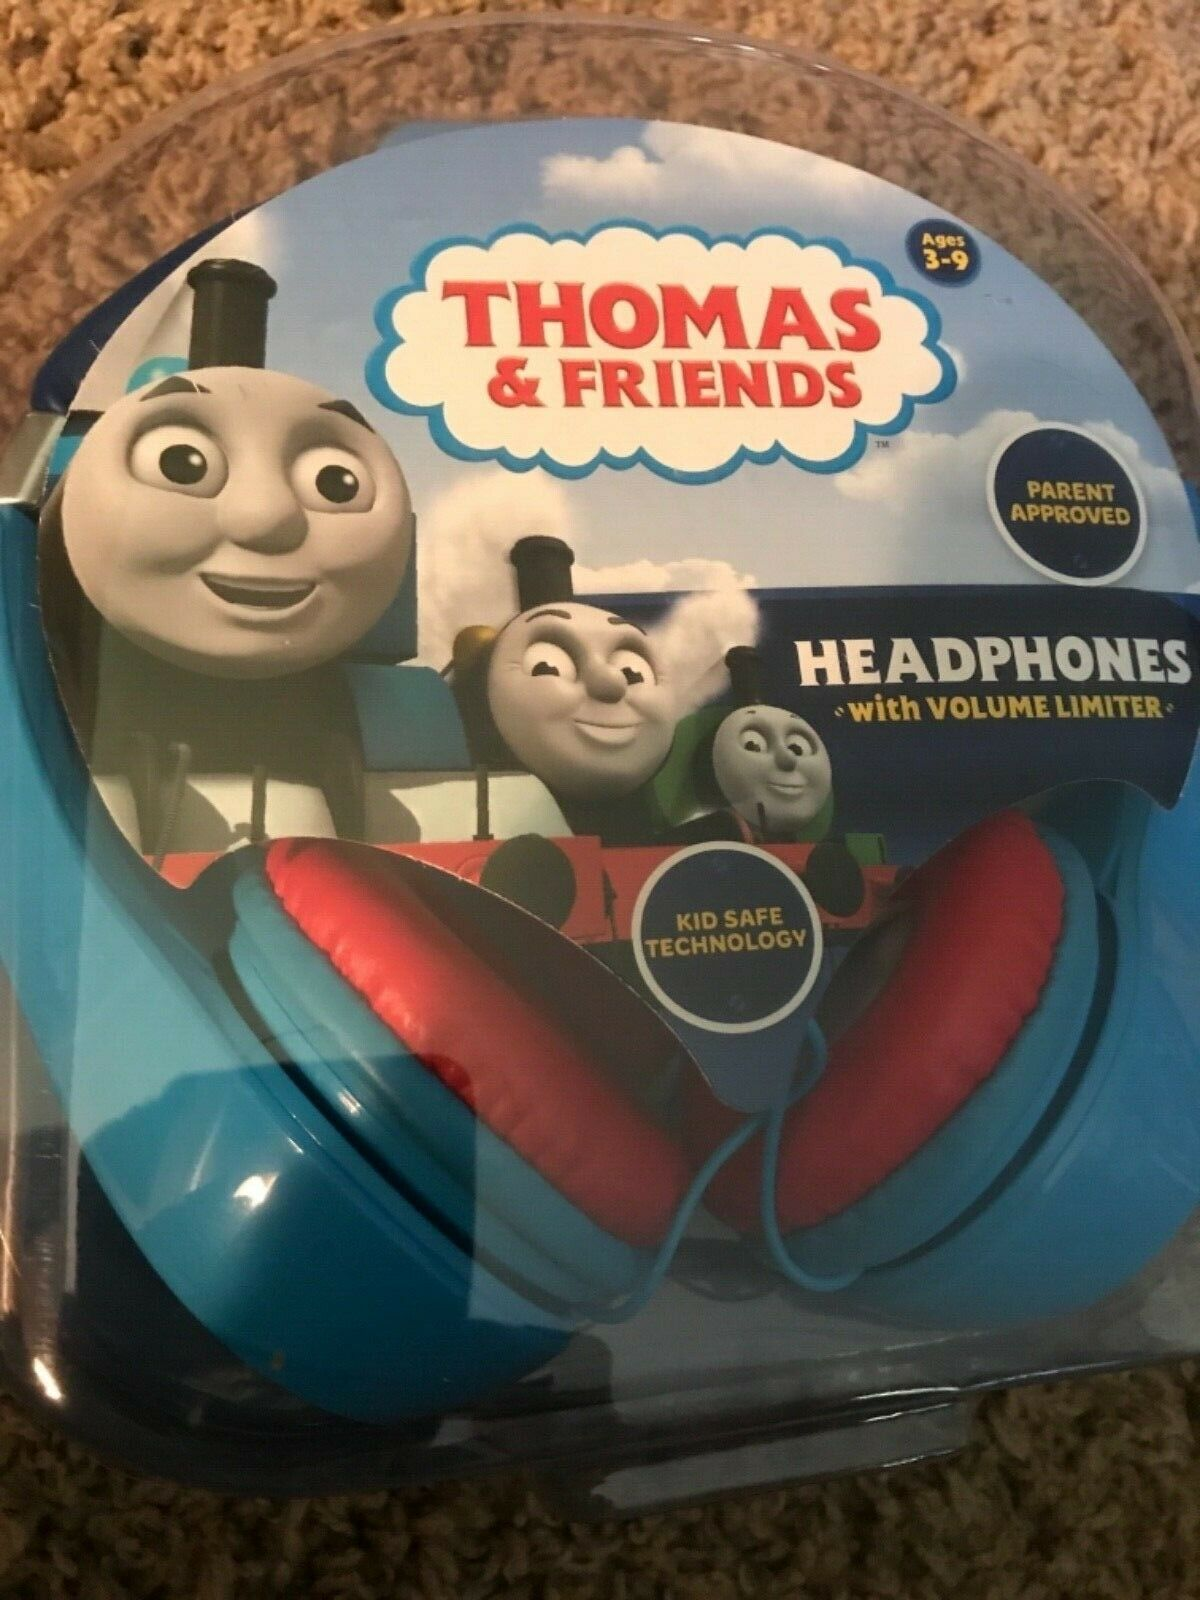 Thomas & Friends Kids Friendly Headphones